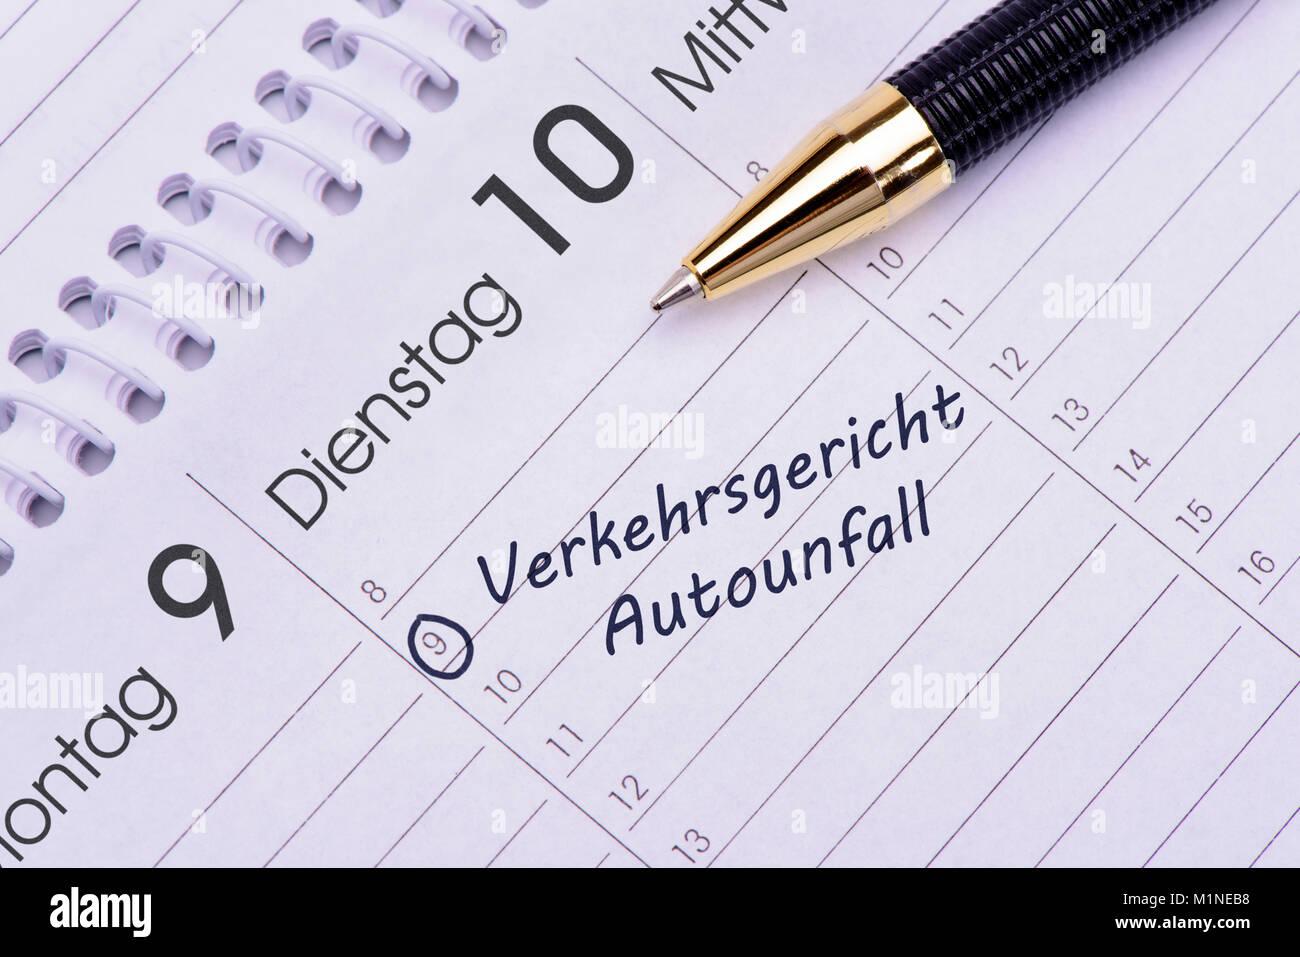 Verkehrsgericht für Autounfall  Termin im Kalender Stock Photo